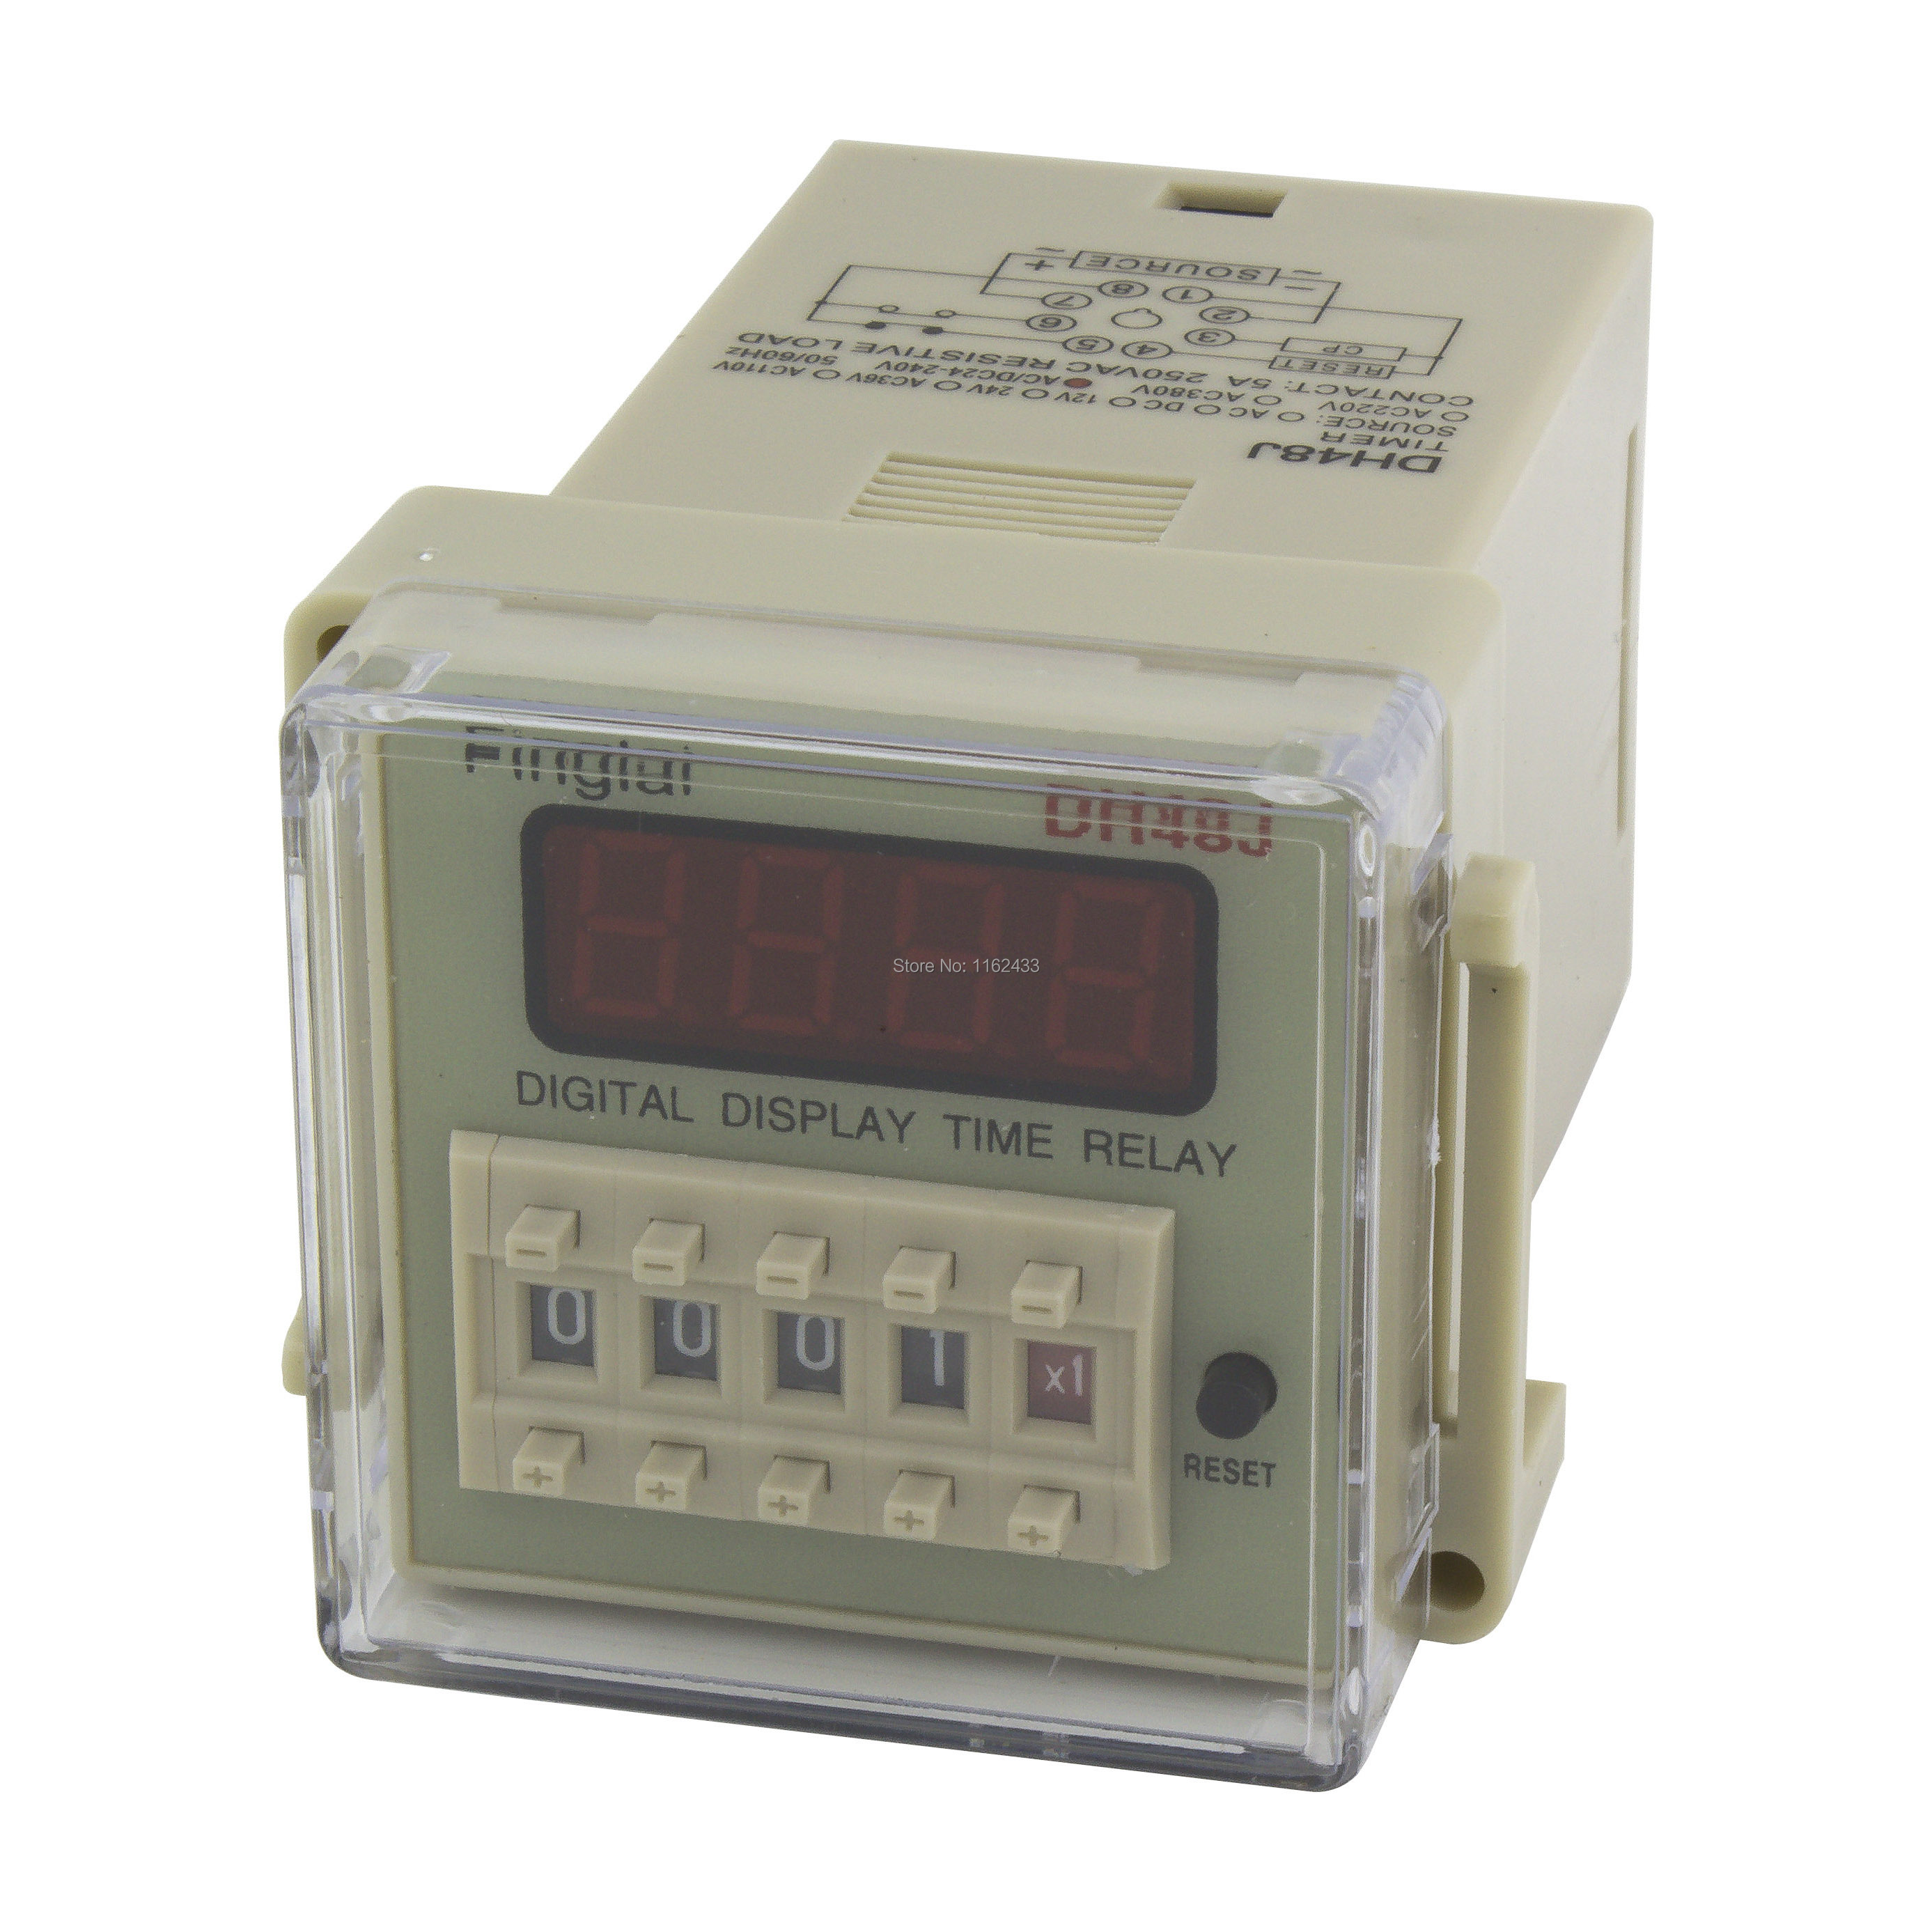 finder relay 8 pin diagram dh48j 8 8 pin contact signal input digital counter relay dh48j  input digital counter relay dh48j